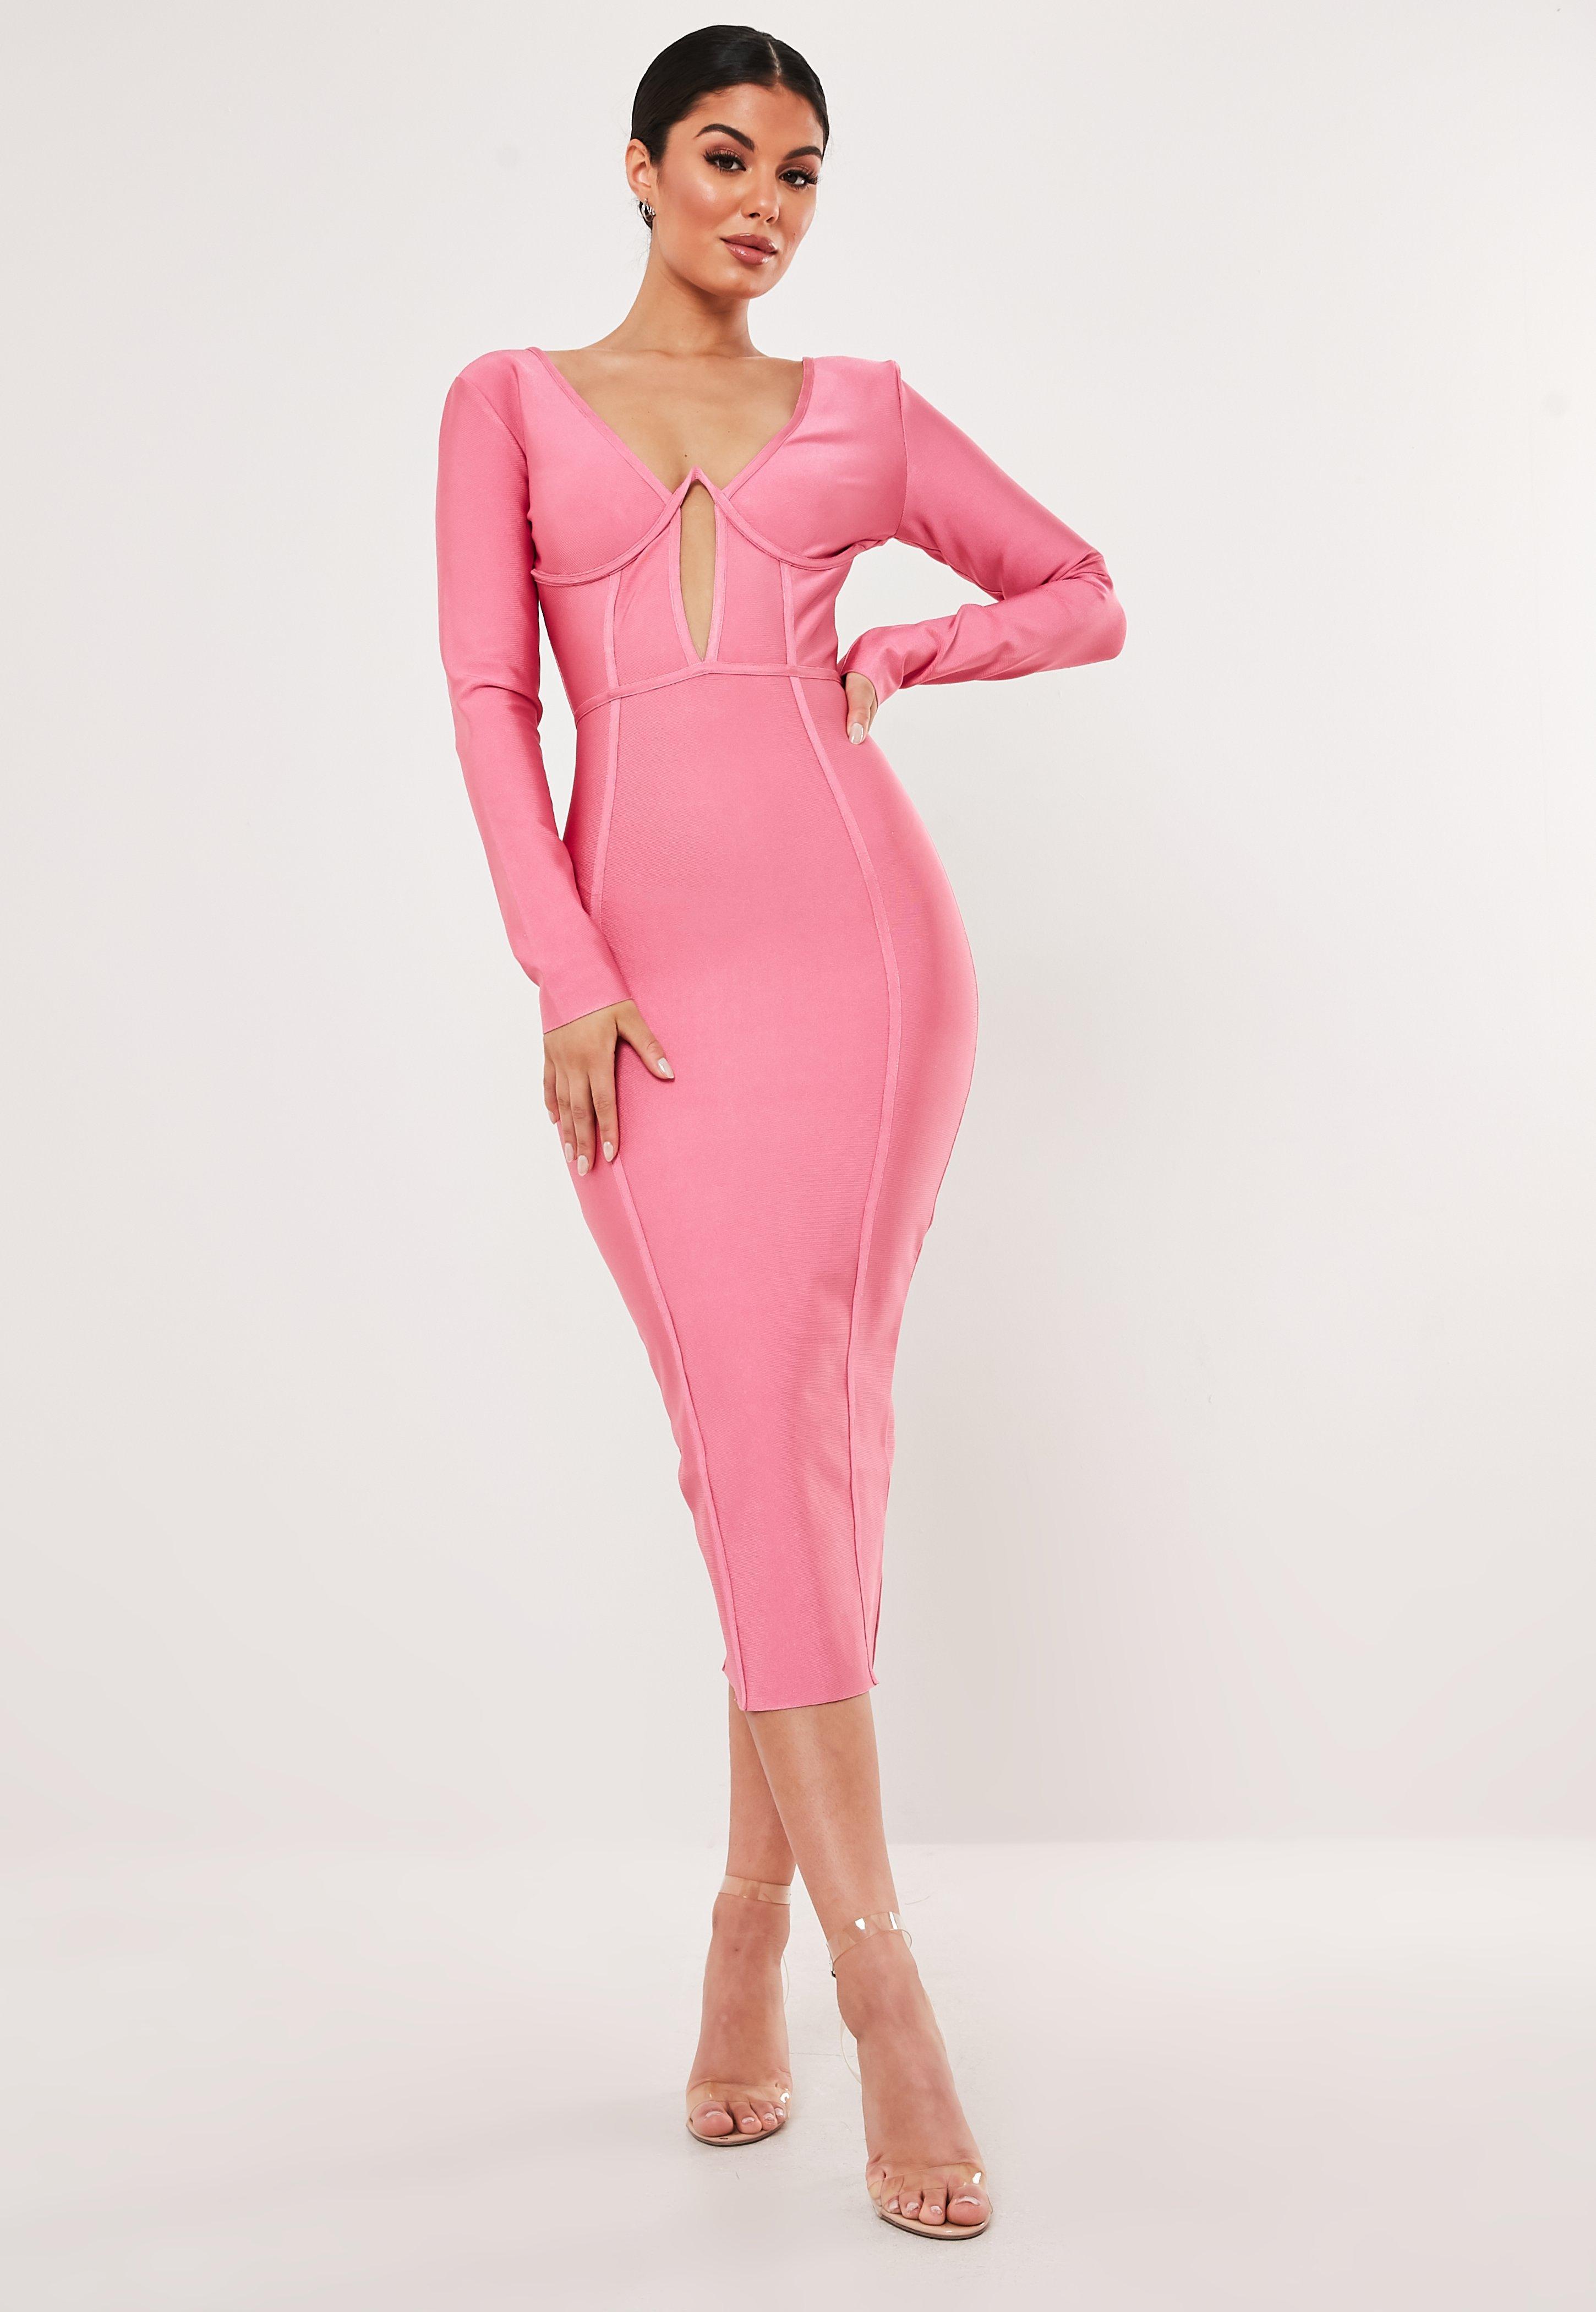 6159a1761476 Midi Dresses | Knee Length Dresses - Missguided